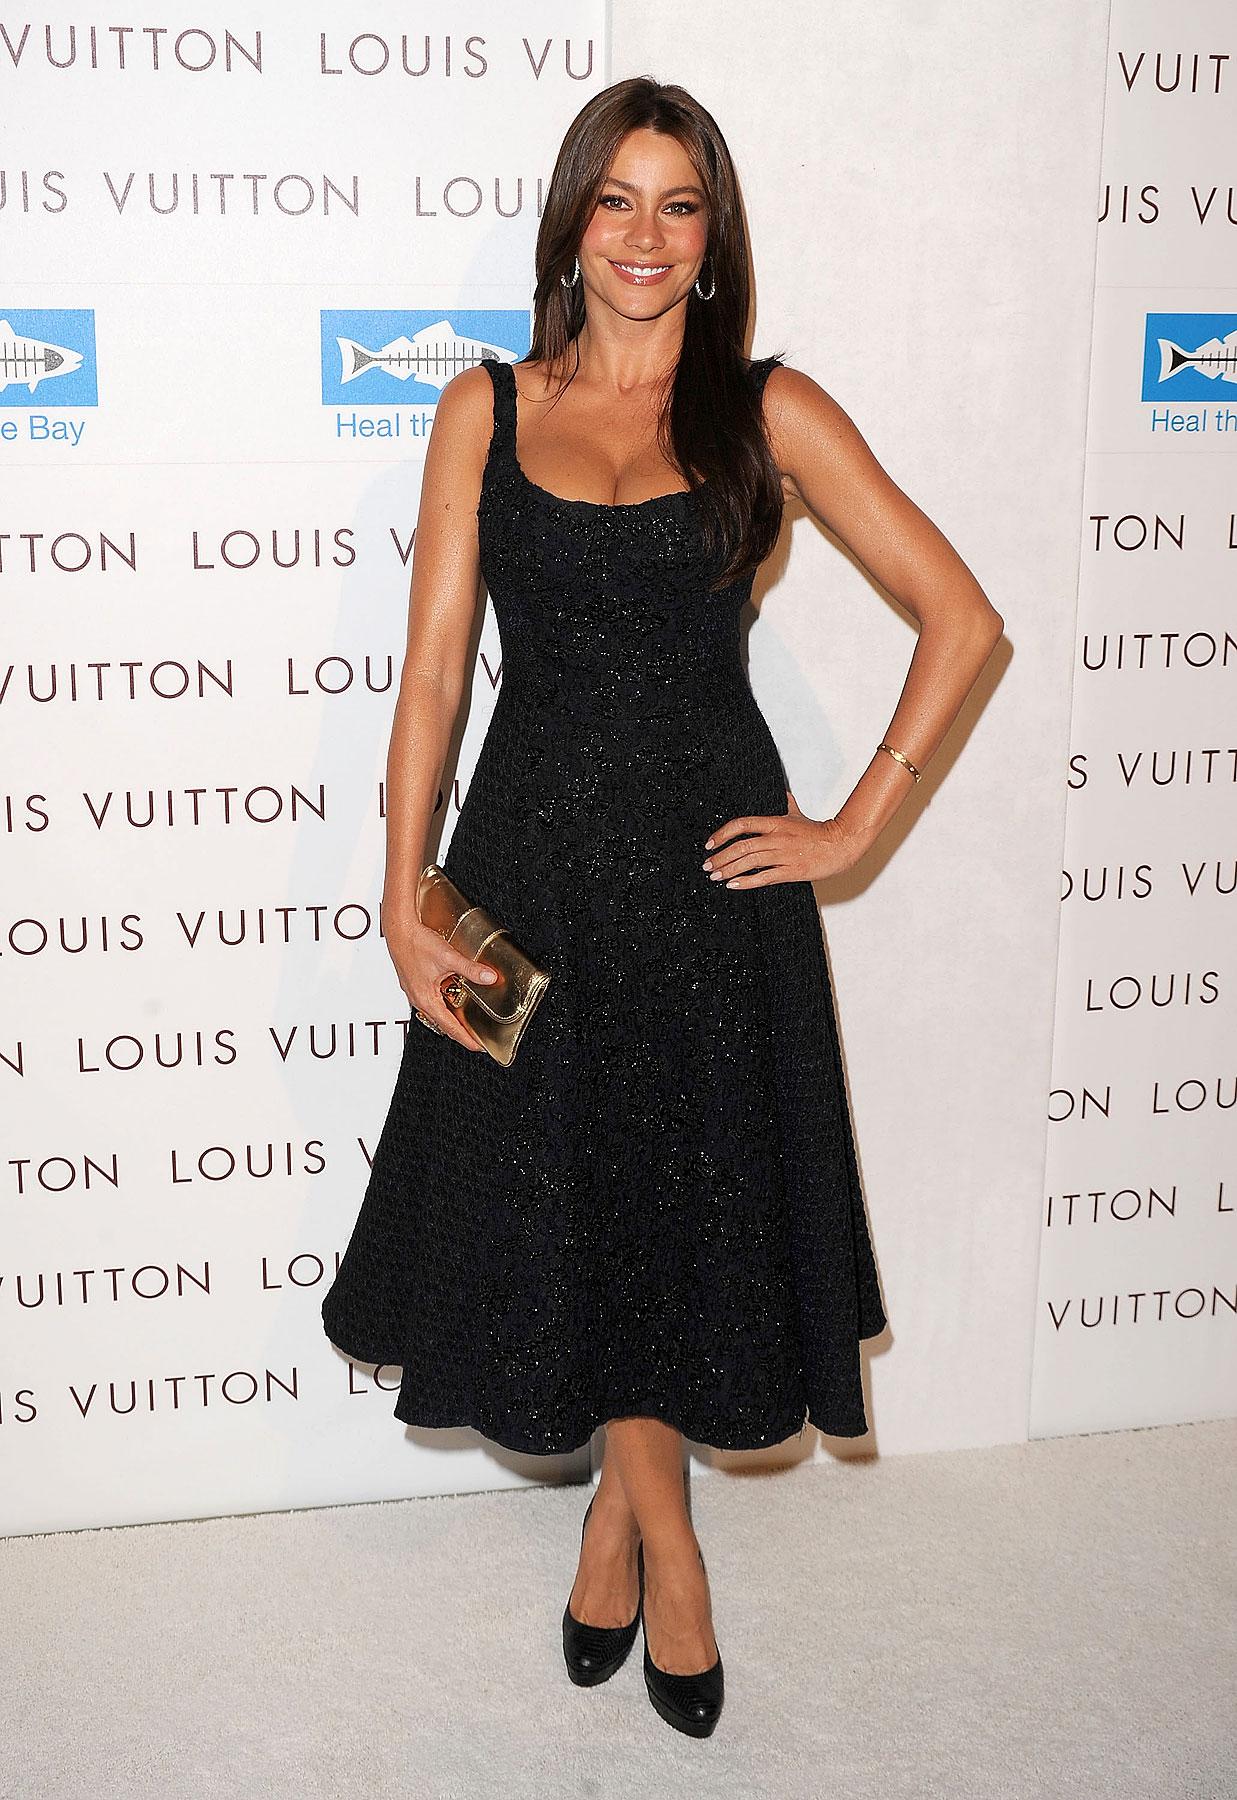 Sofia Vergara Stuns At Louis Vuitton Santa Monica (PHOTOS)